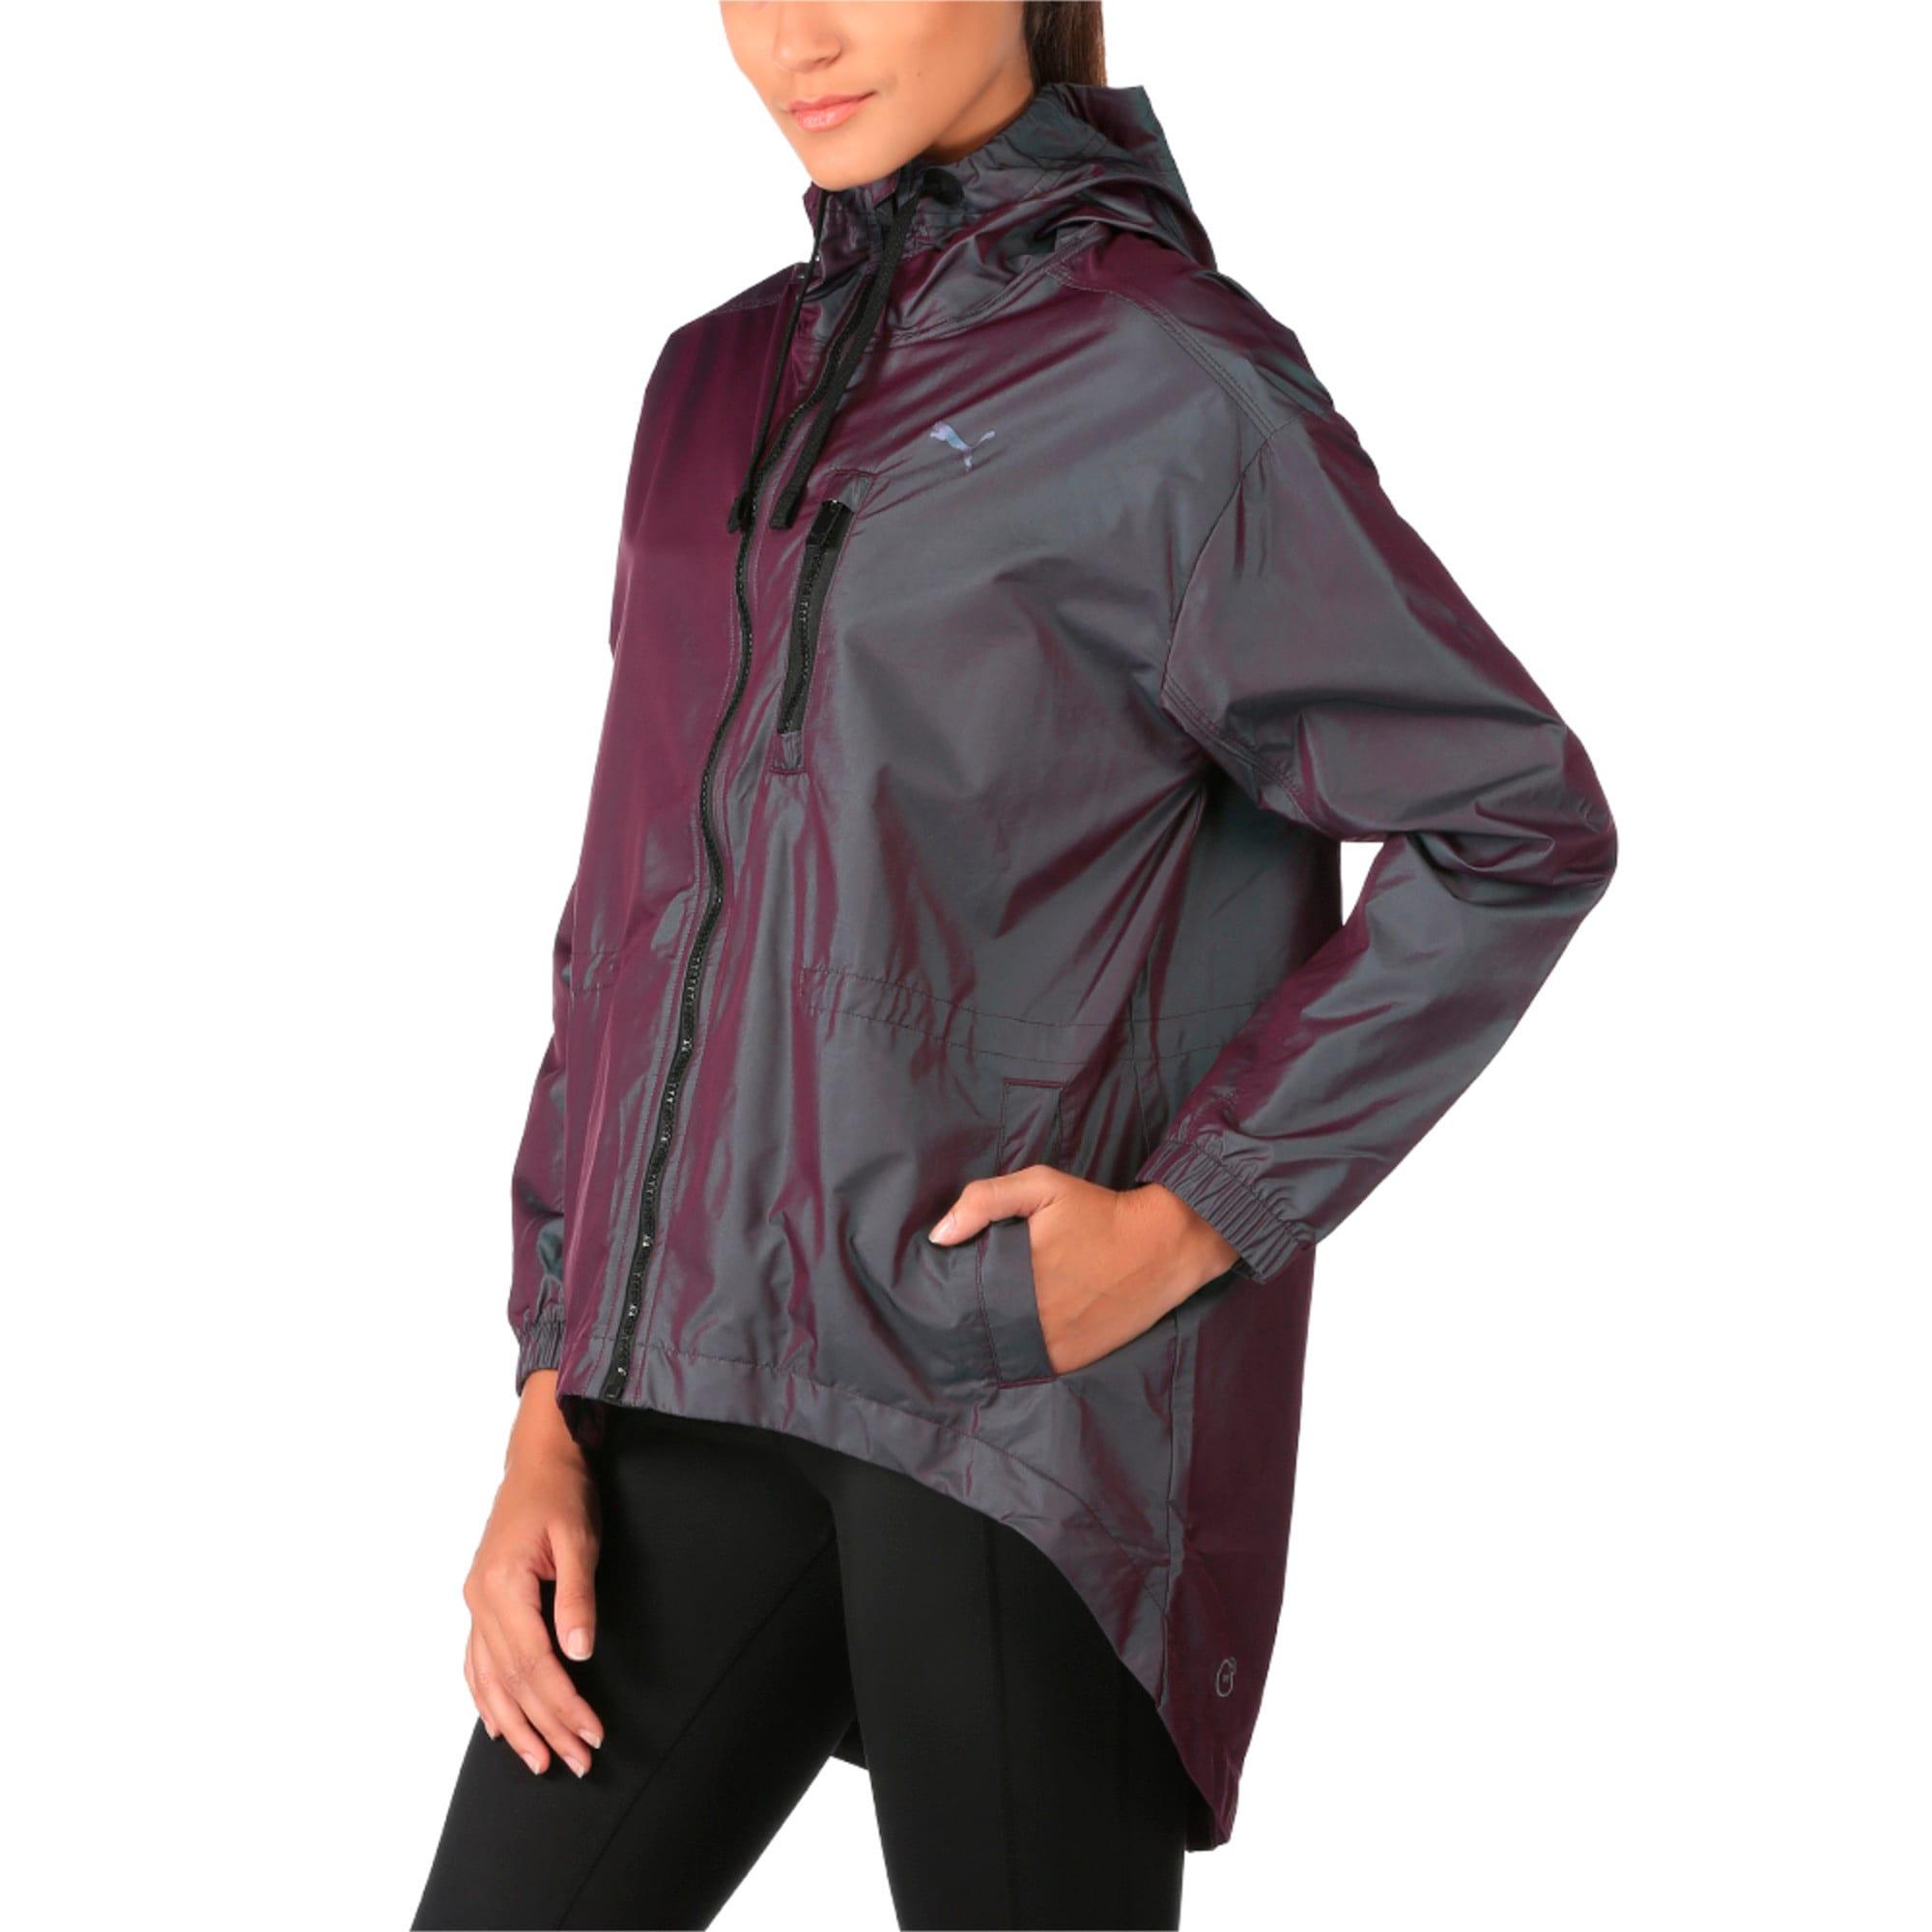 Thumbnail 4 of Active Training Women's Explosive Jacket, Plum Perfect-Iridescent, medium-IND